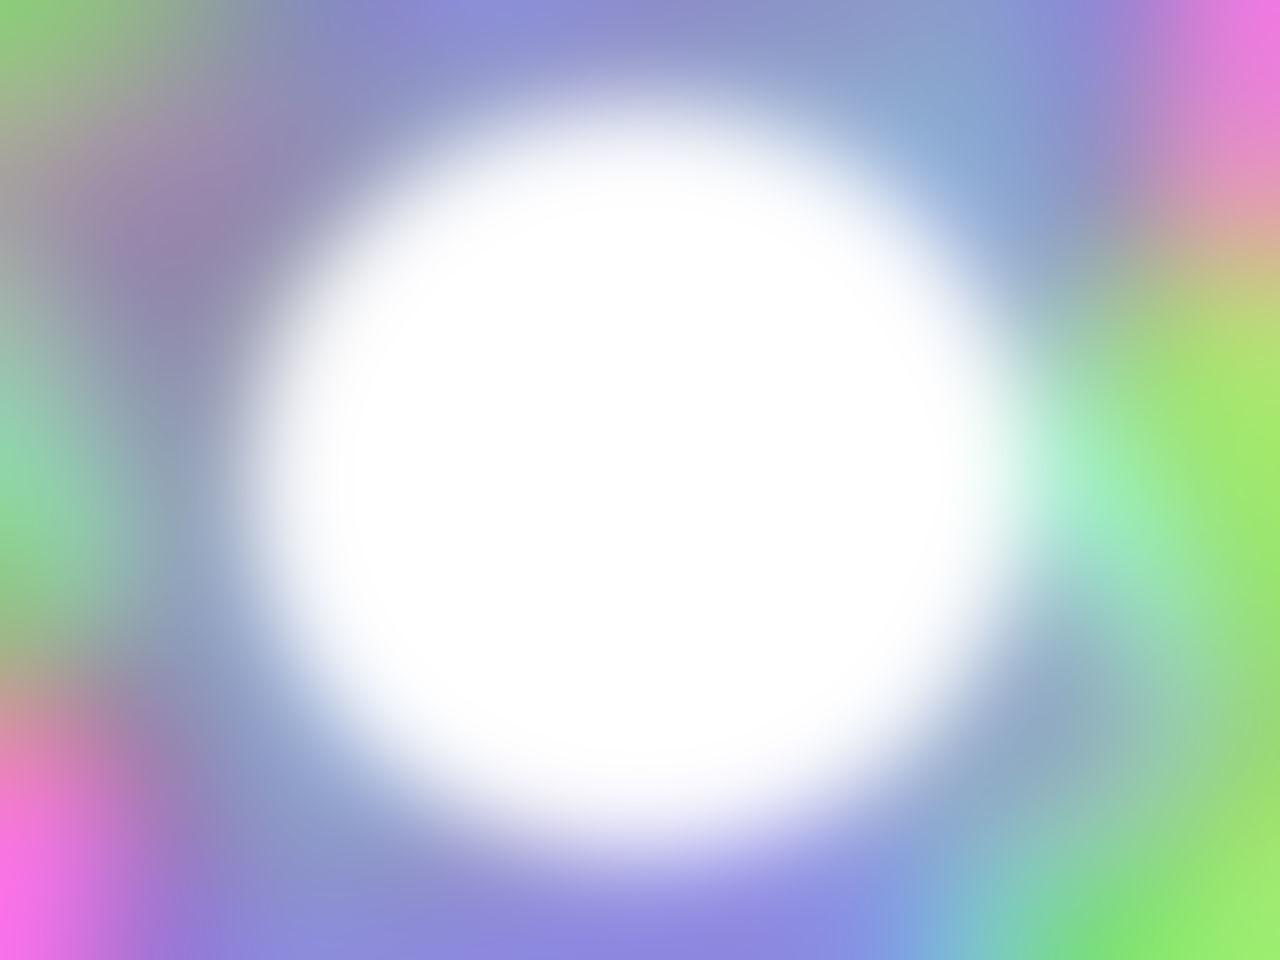 FULL FRAME SHOT OF ABSTRACT LIGHTS